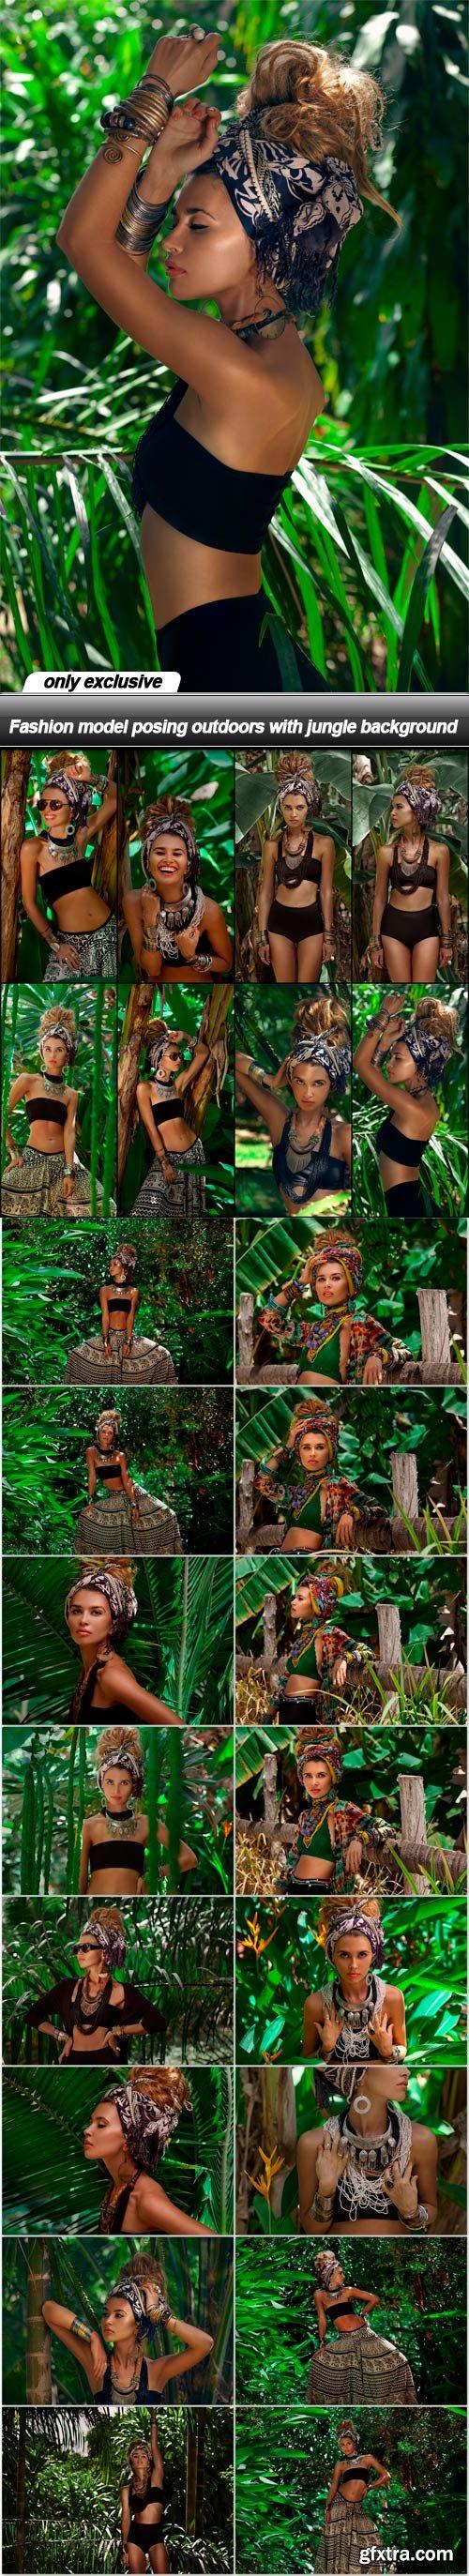 Fashion model posing outdoors with jungle background - 24 UHQ JPEG